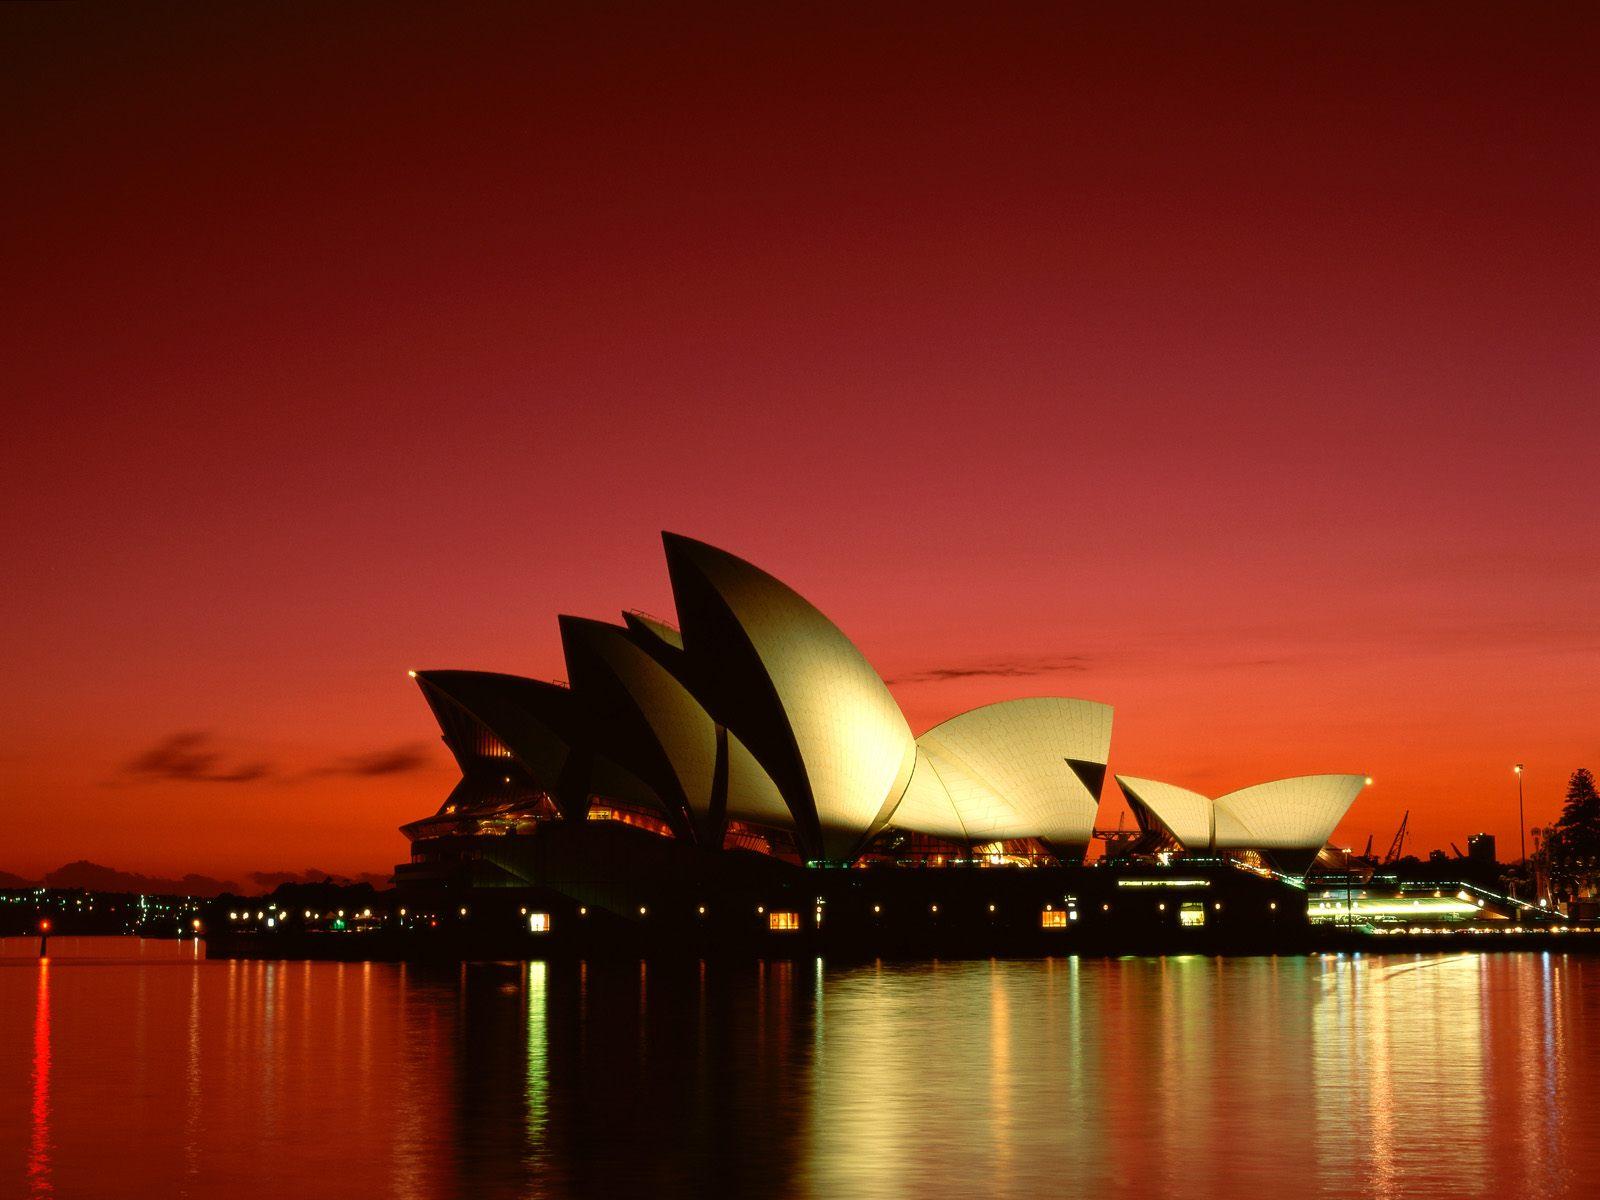 http://2.bp.blogspot.com/_3ynXbgNZasA/TTrde43Rm4I/AAAAAAAAASU/-wz3uzDdn1Q/s1600/Scarlet+Night%252C+Sydney+Opera+House%252C+Sydney%252C+Australia.jpg